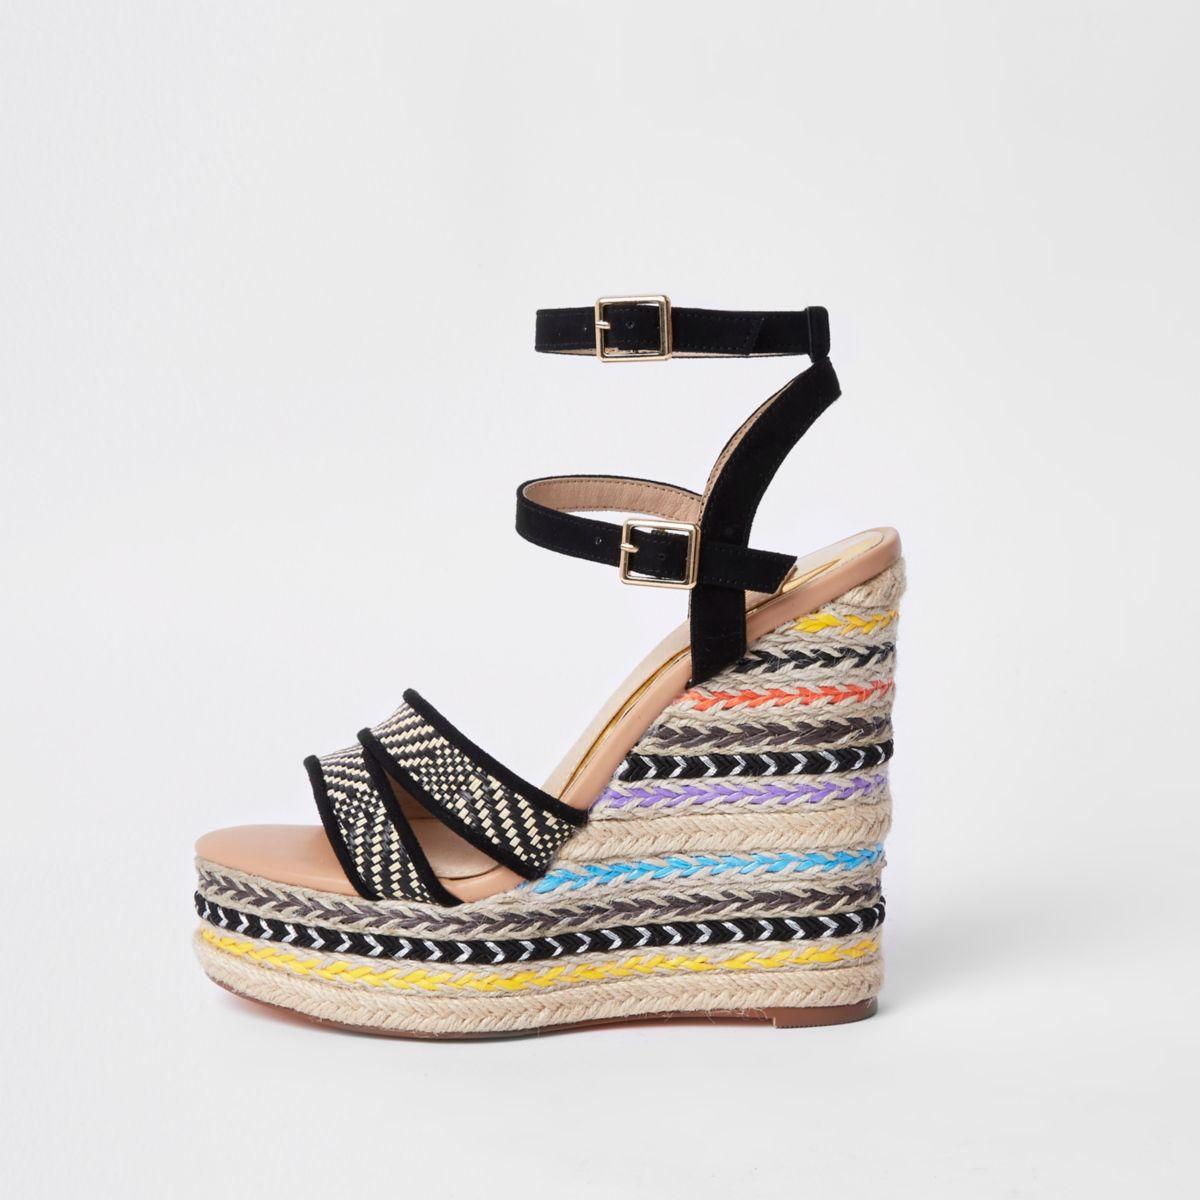 Zwarte gestreepte schoenen met plateauzool en sleehak